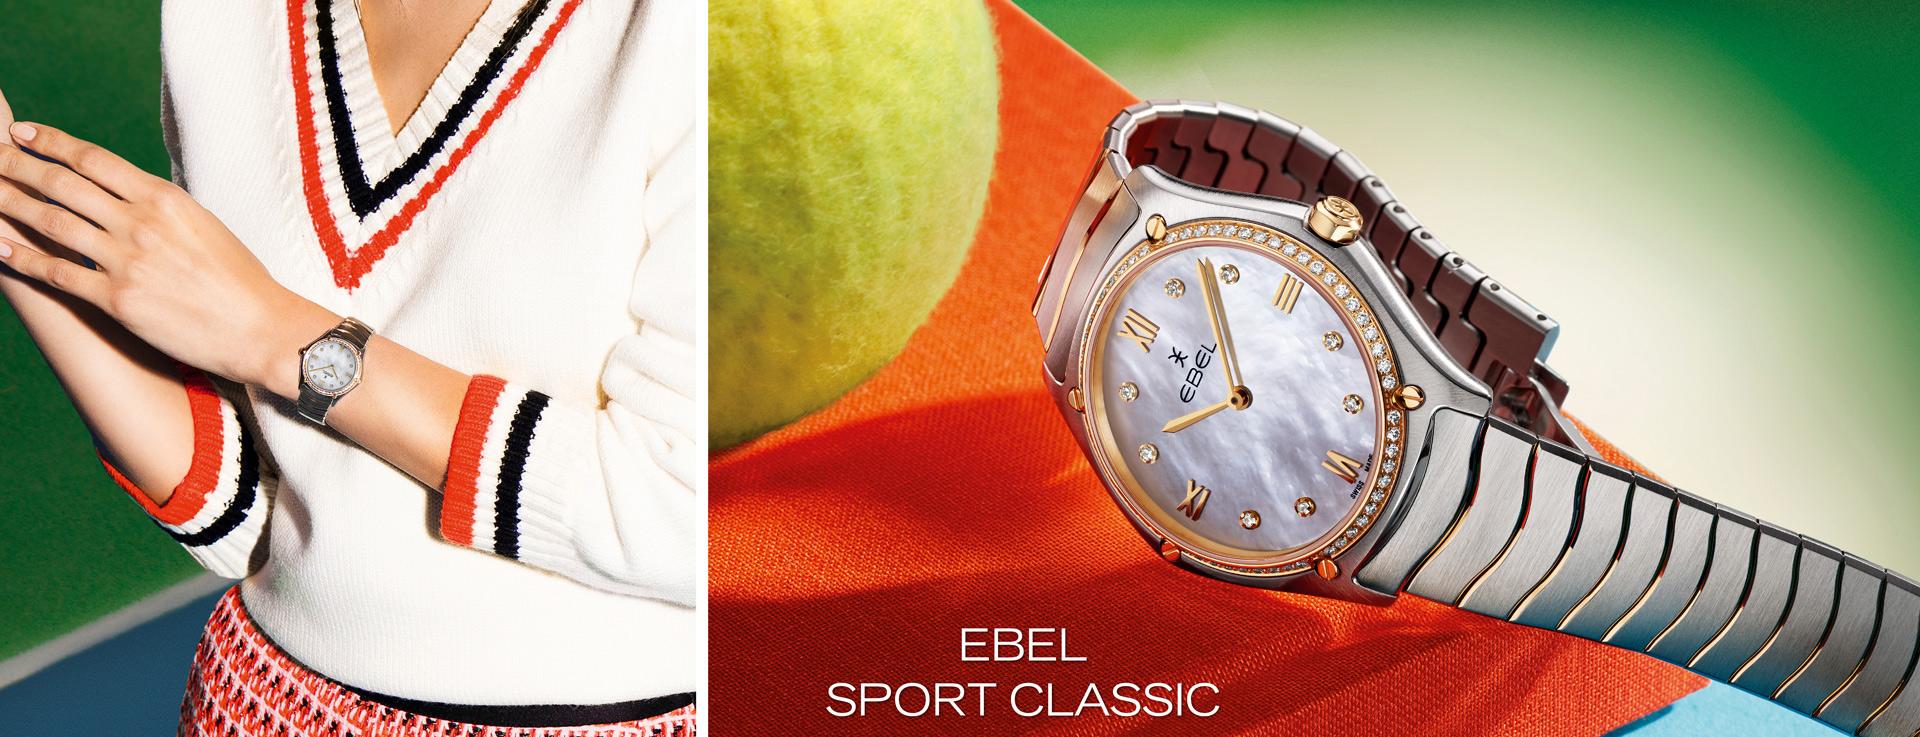 EBEL_CH_Staehli_Banners_Kom1920x820px_ESC_MOP_33_Tenis_HR